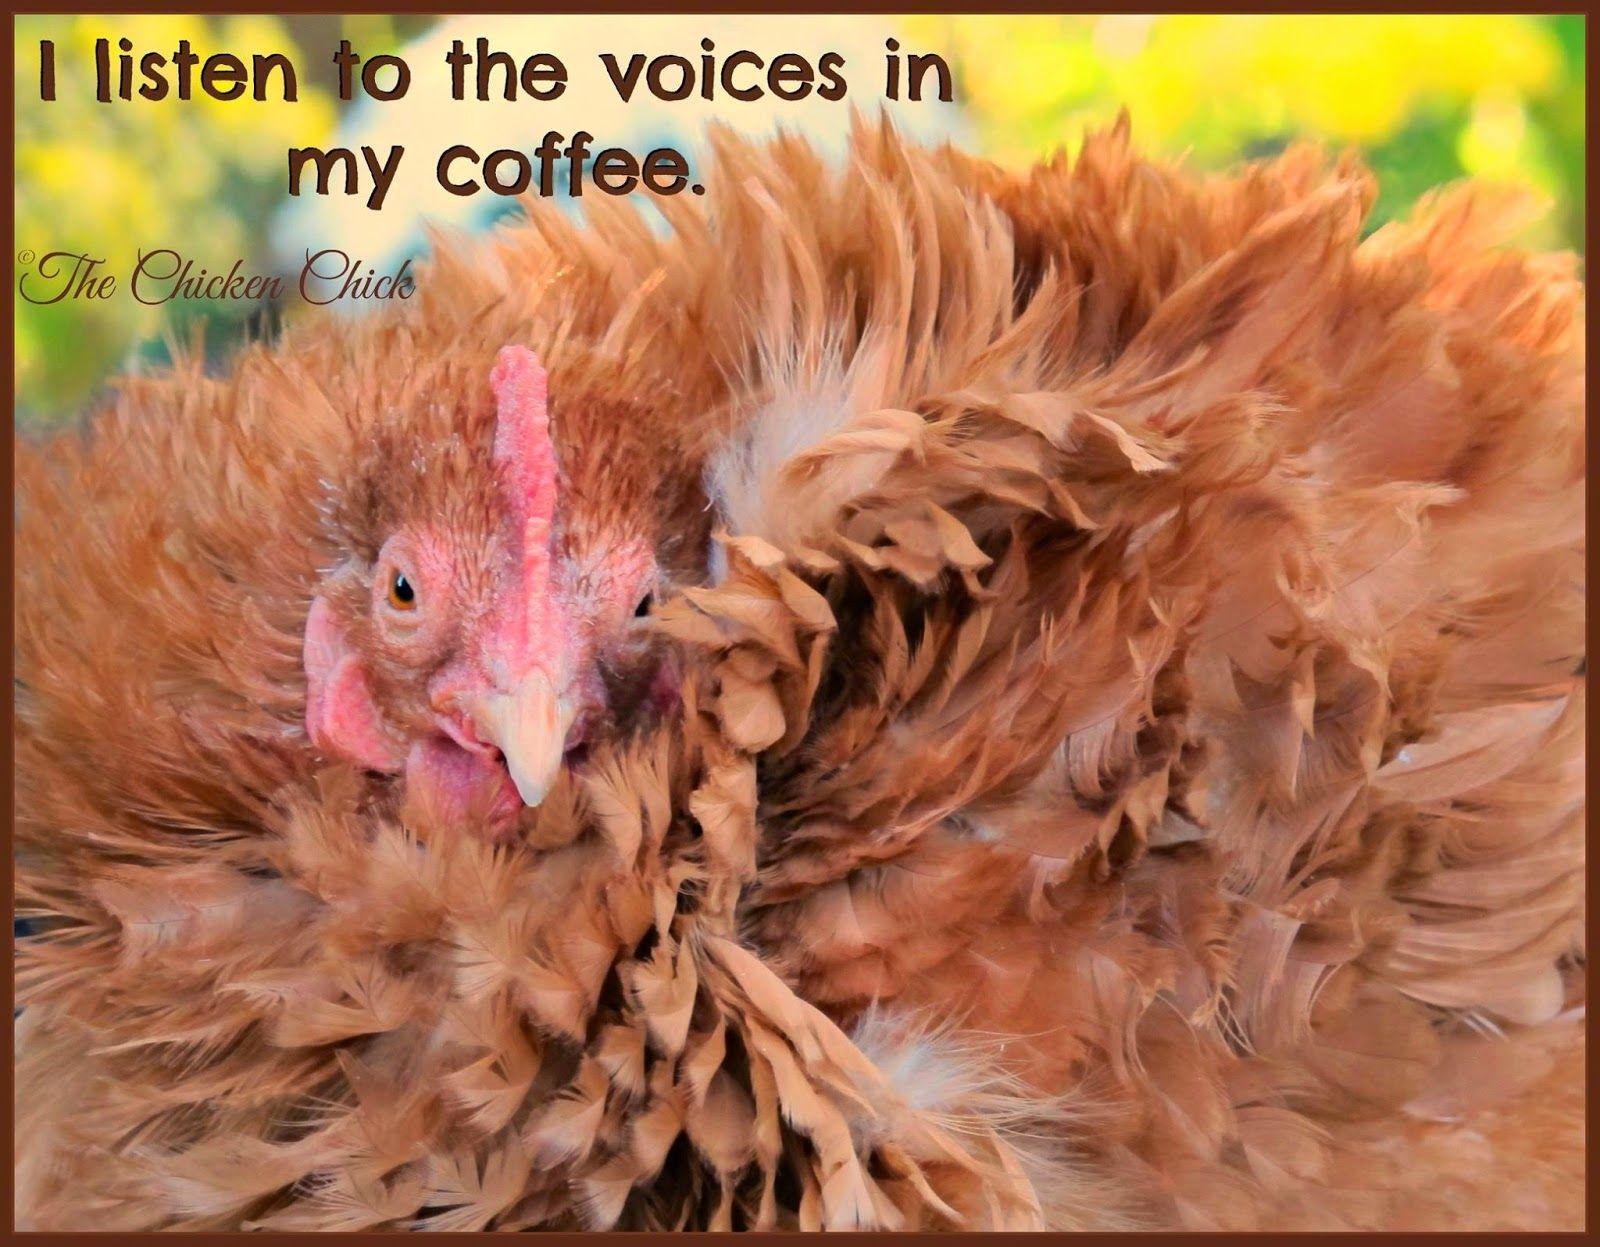 Black Friday Coffee Meme